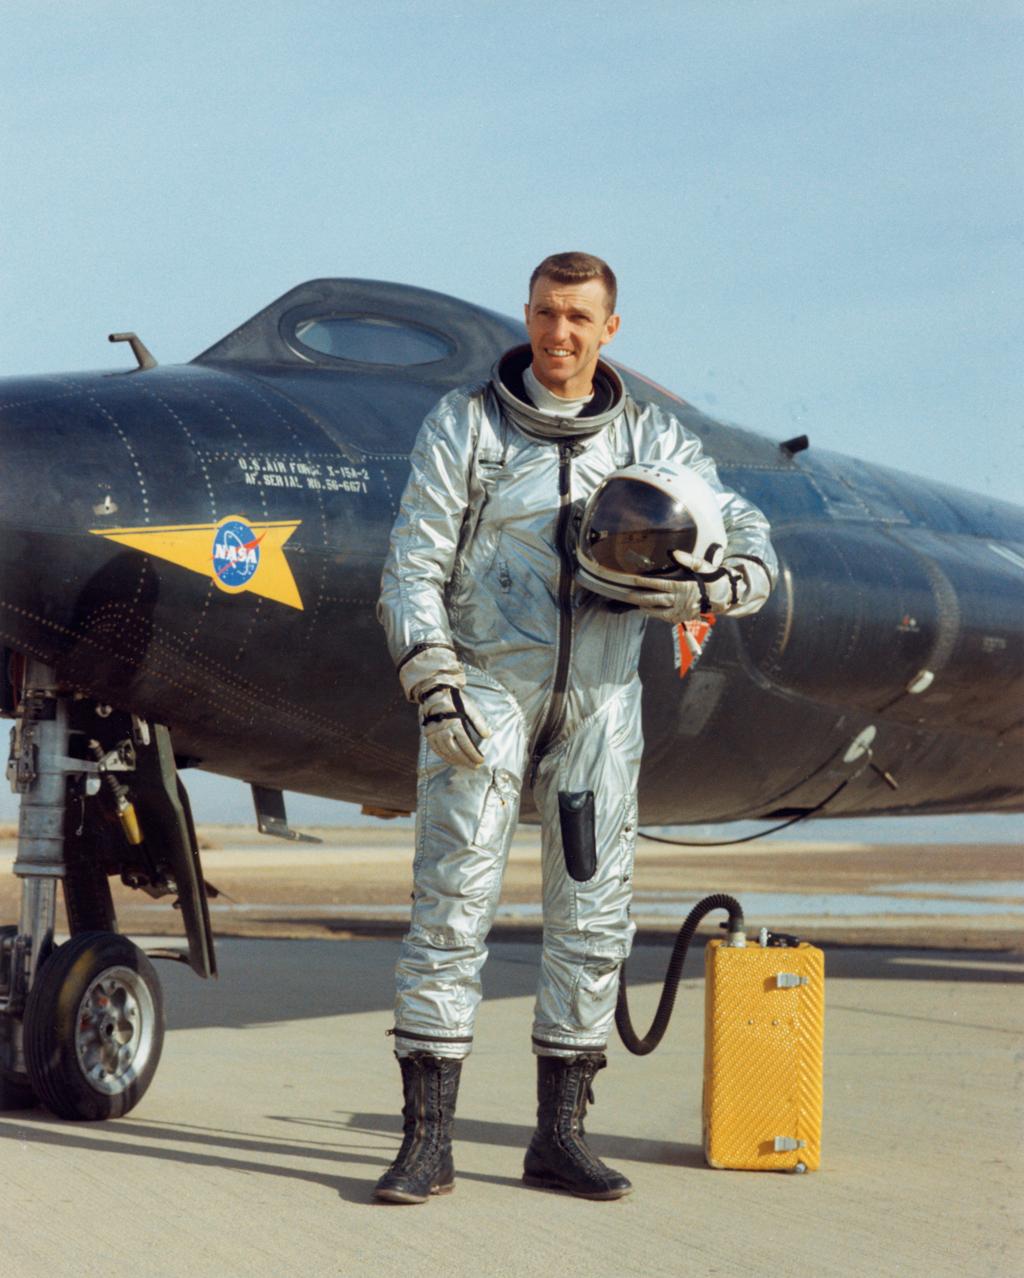 Joe Engle during the X-15 program.